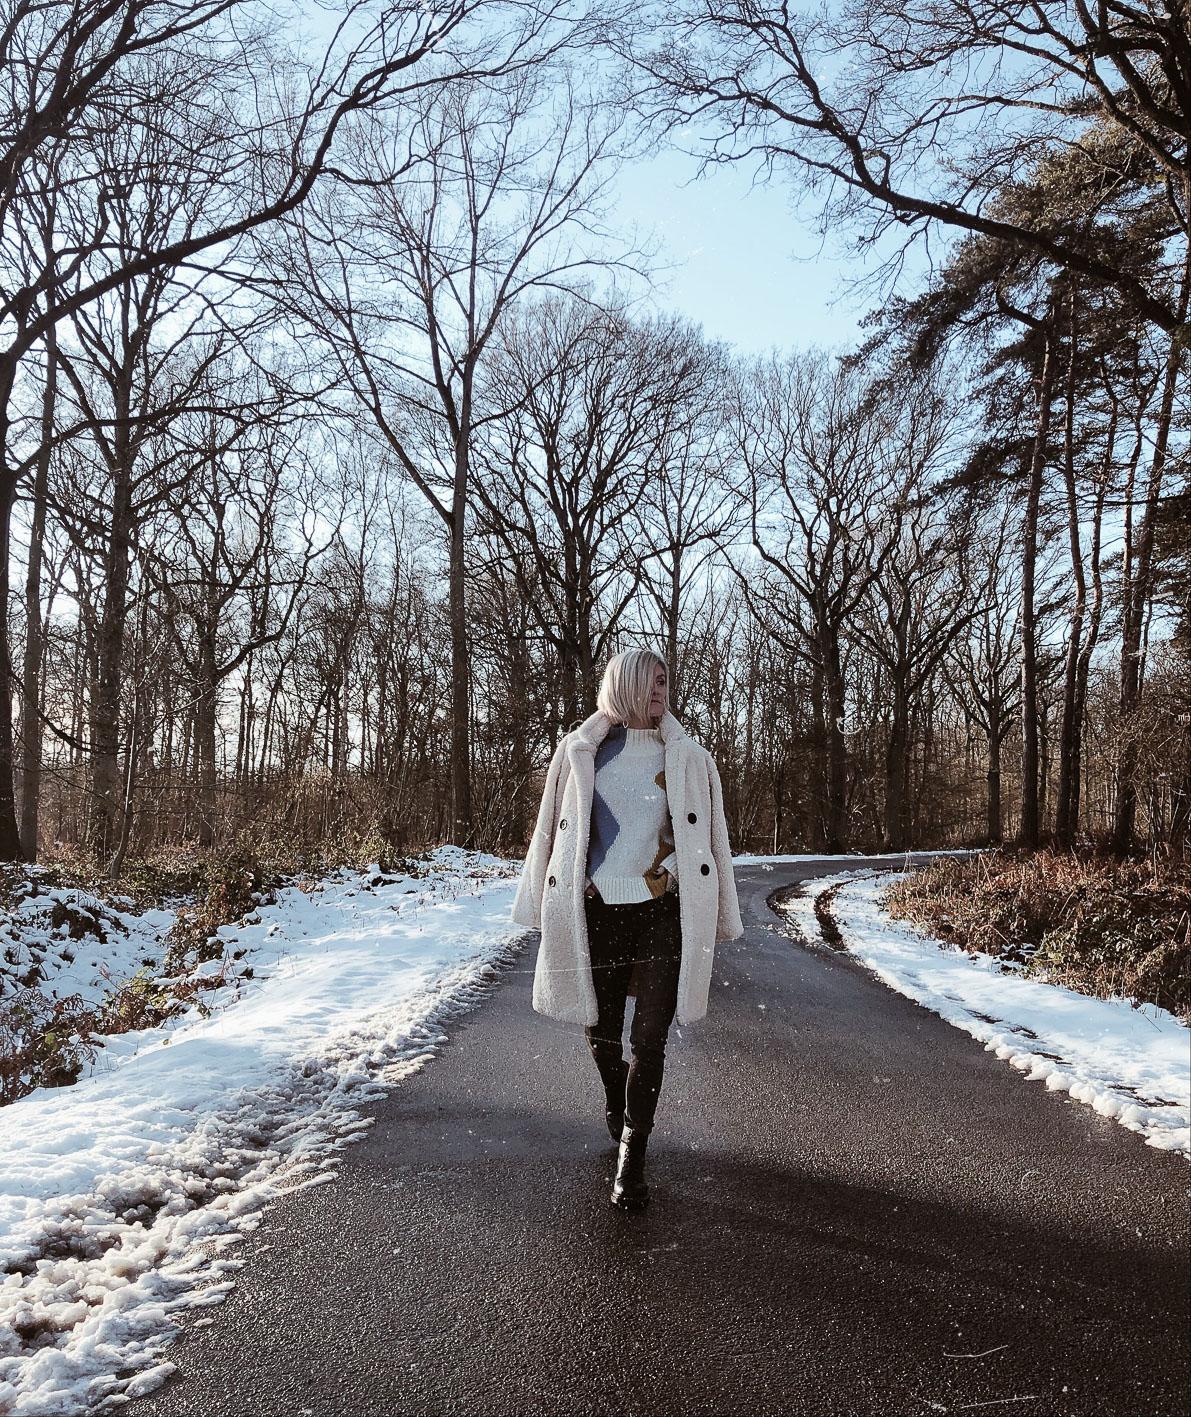 Carnet Sauvage - Blog mode et tendances, idée look hiver, pull &other stories